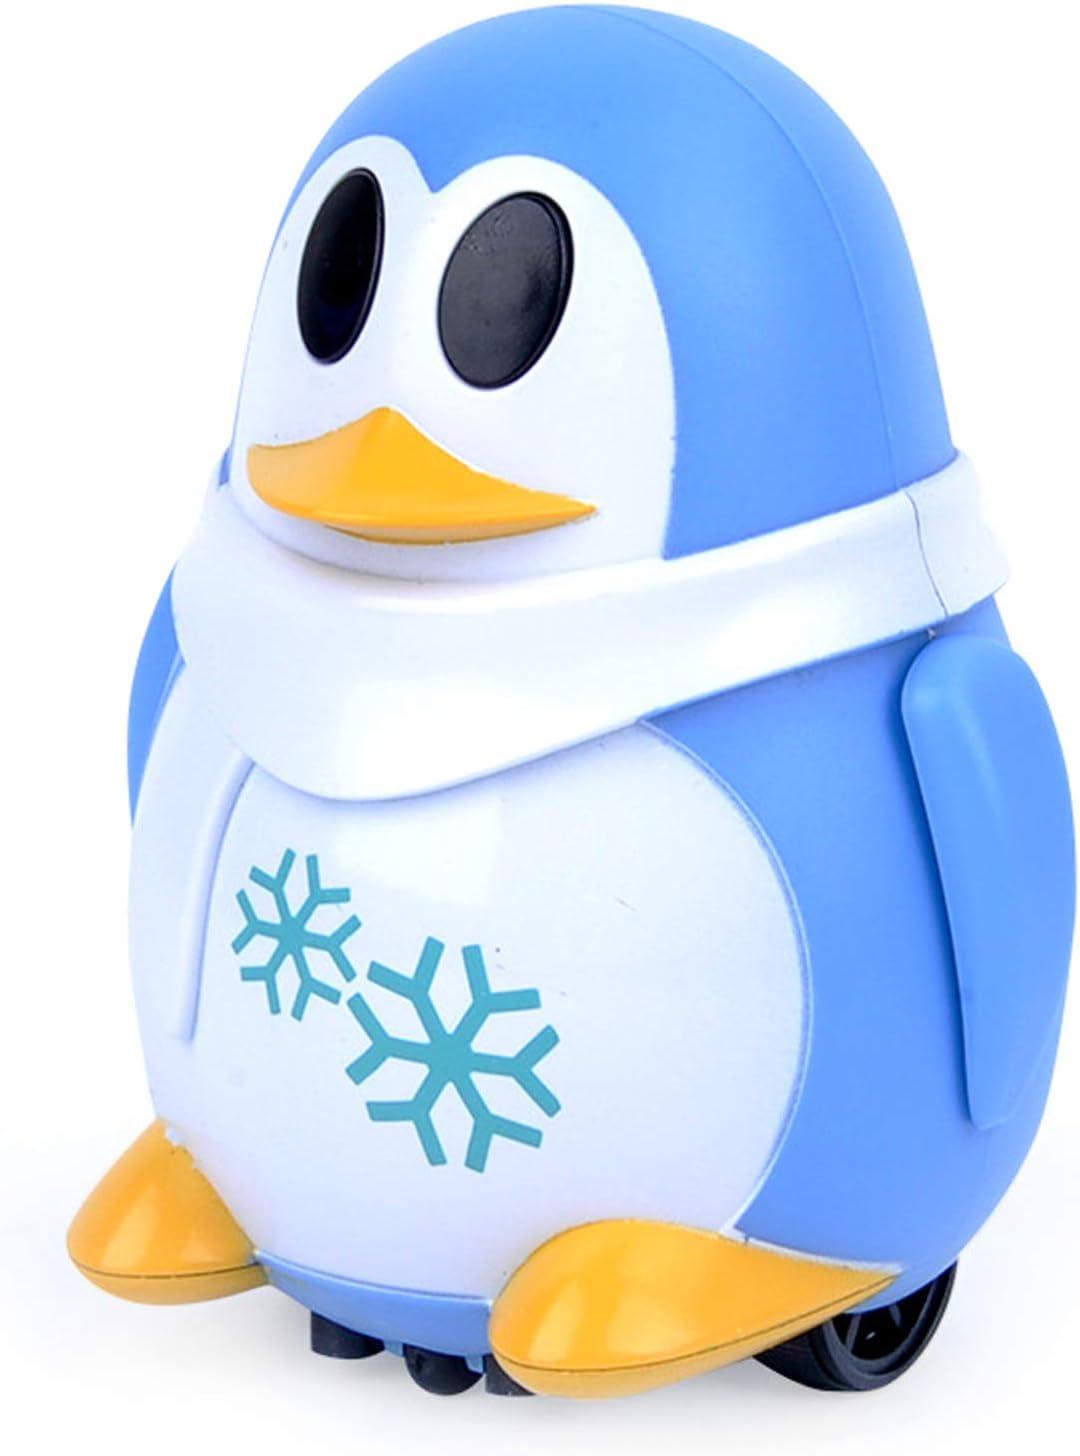 robot inductivo robot inductivo modelo ni/ños juguete regalo Magic Pen Toy Sigue cualquier l/ínea dibujada Magic Pen Toy